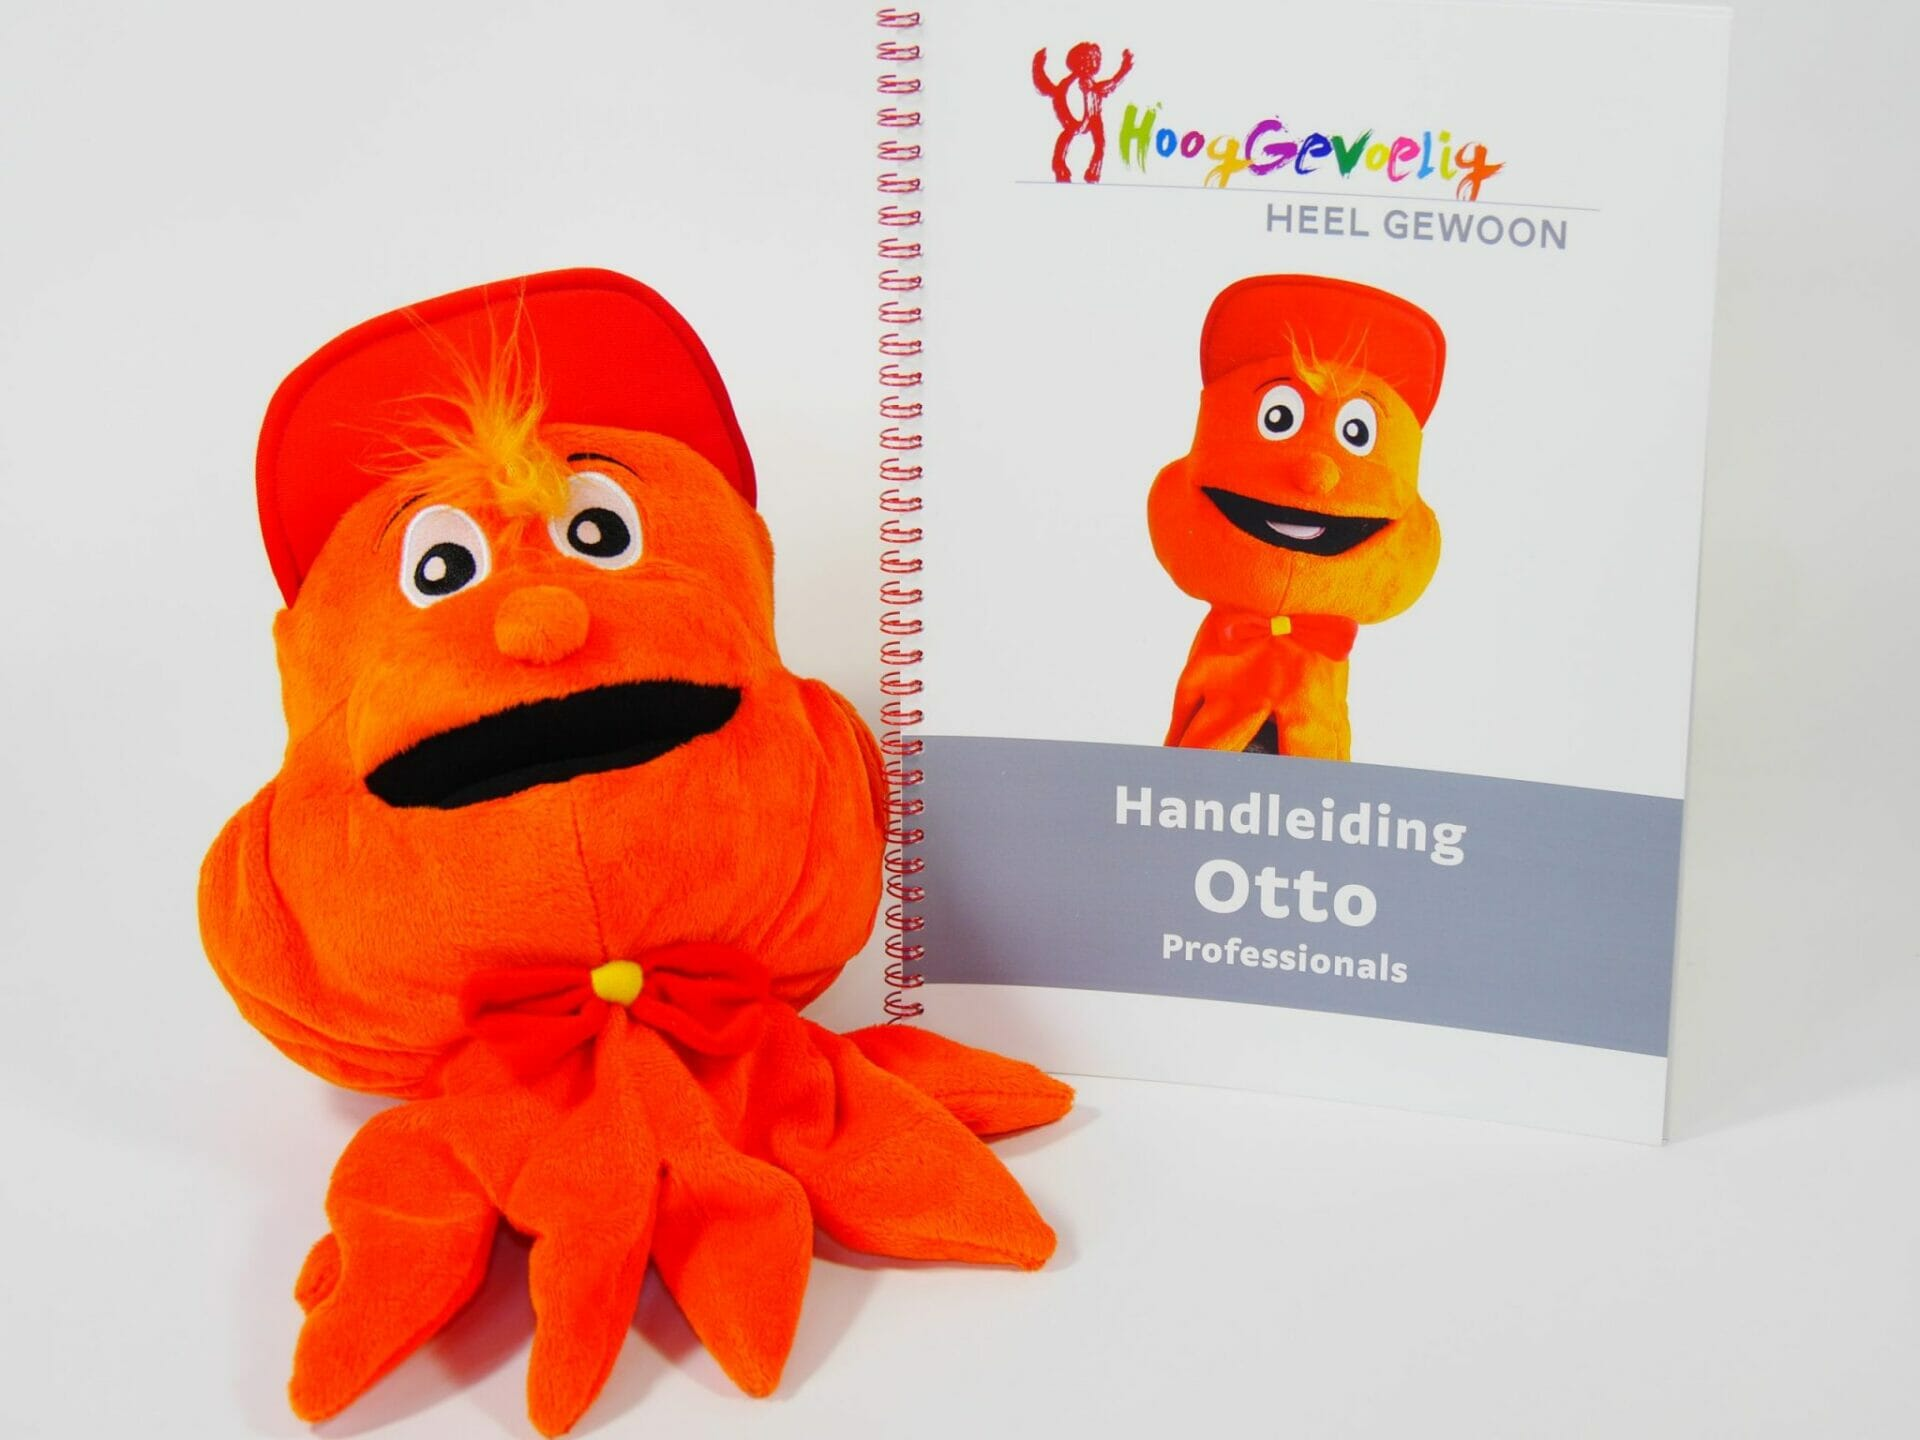 Otto de octopus handleiding professionals